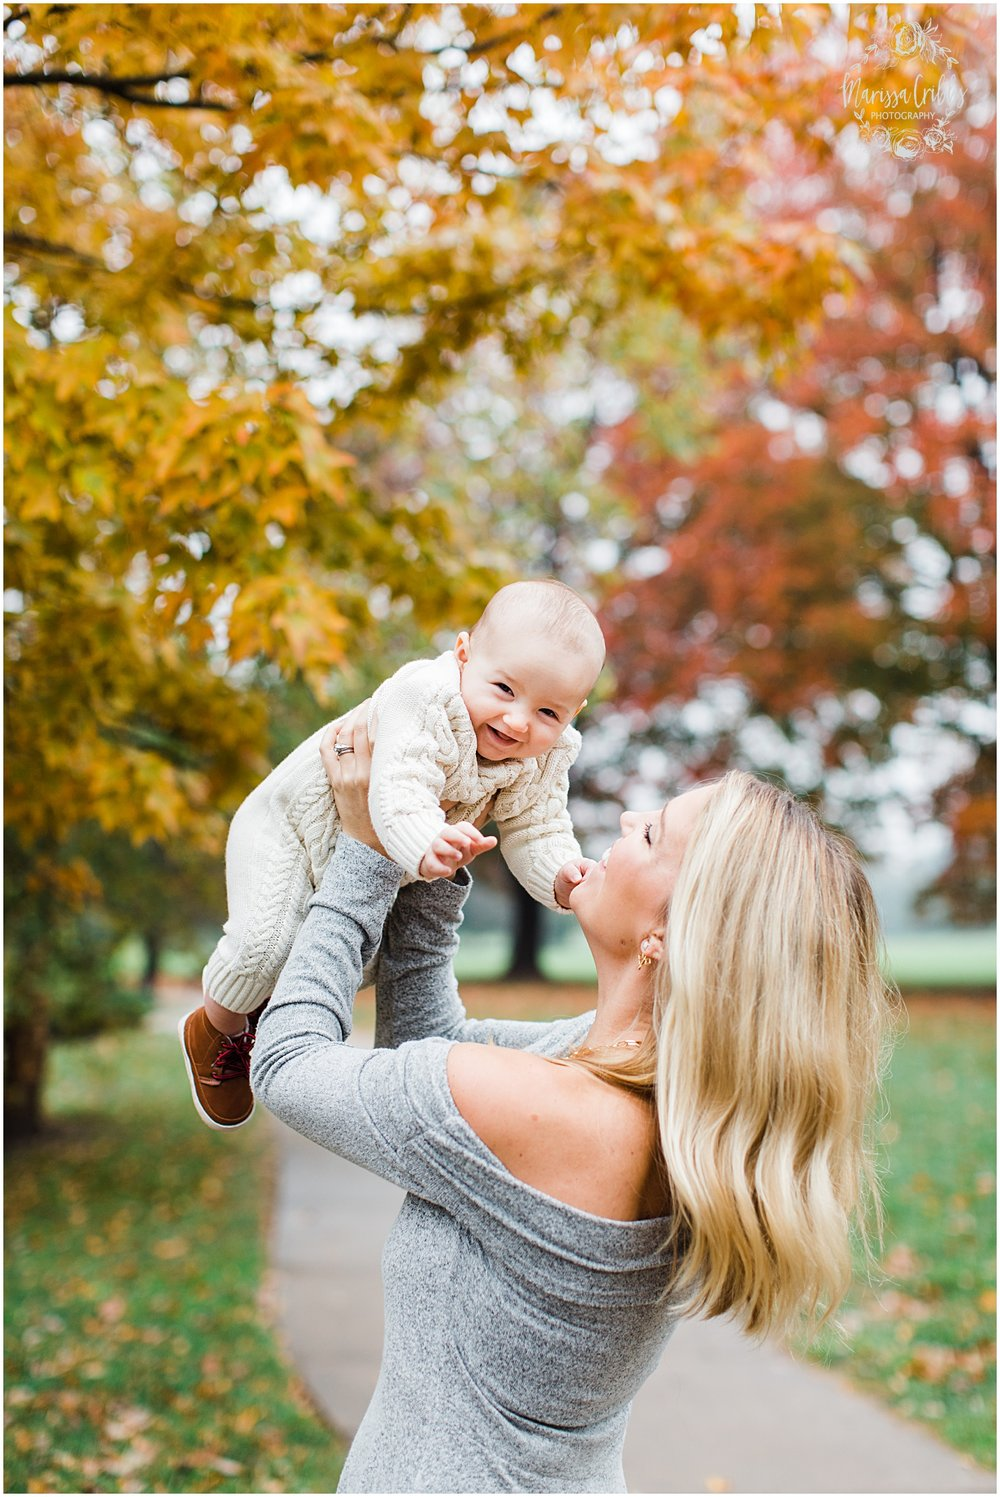 MILLER FAMILY LOOSE PARK | MARISSA CRIBBS PHOTOGRAPHY | KC FAMILY PHOTOGRAPHY_3795.jpg